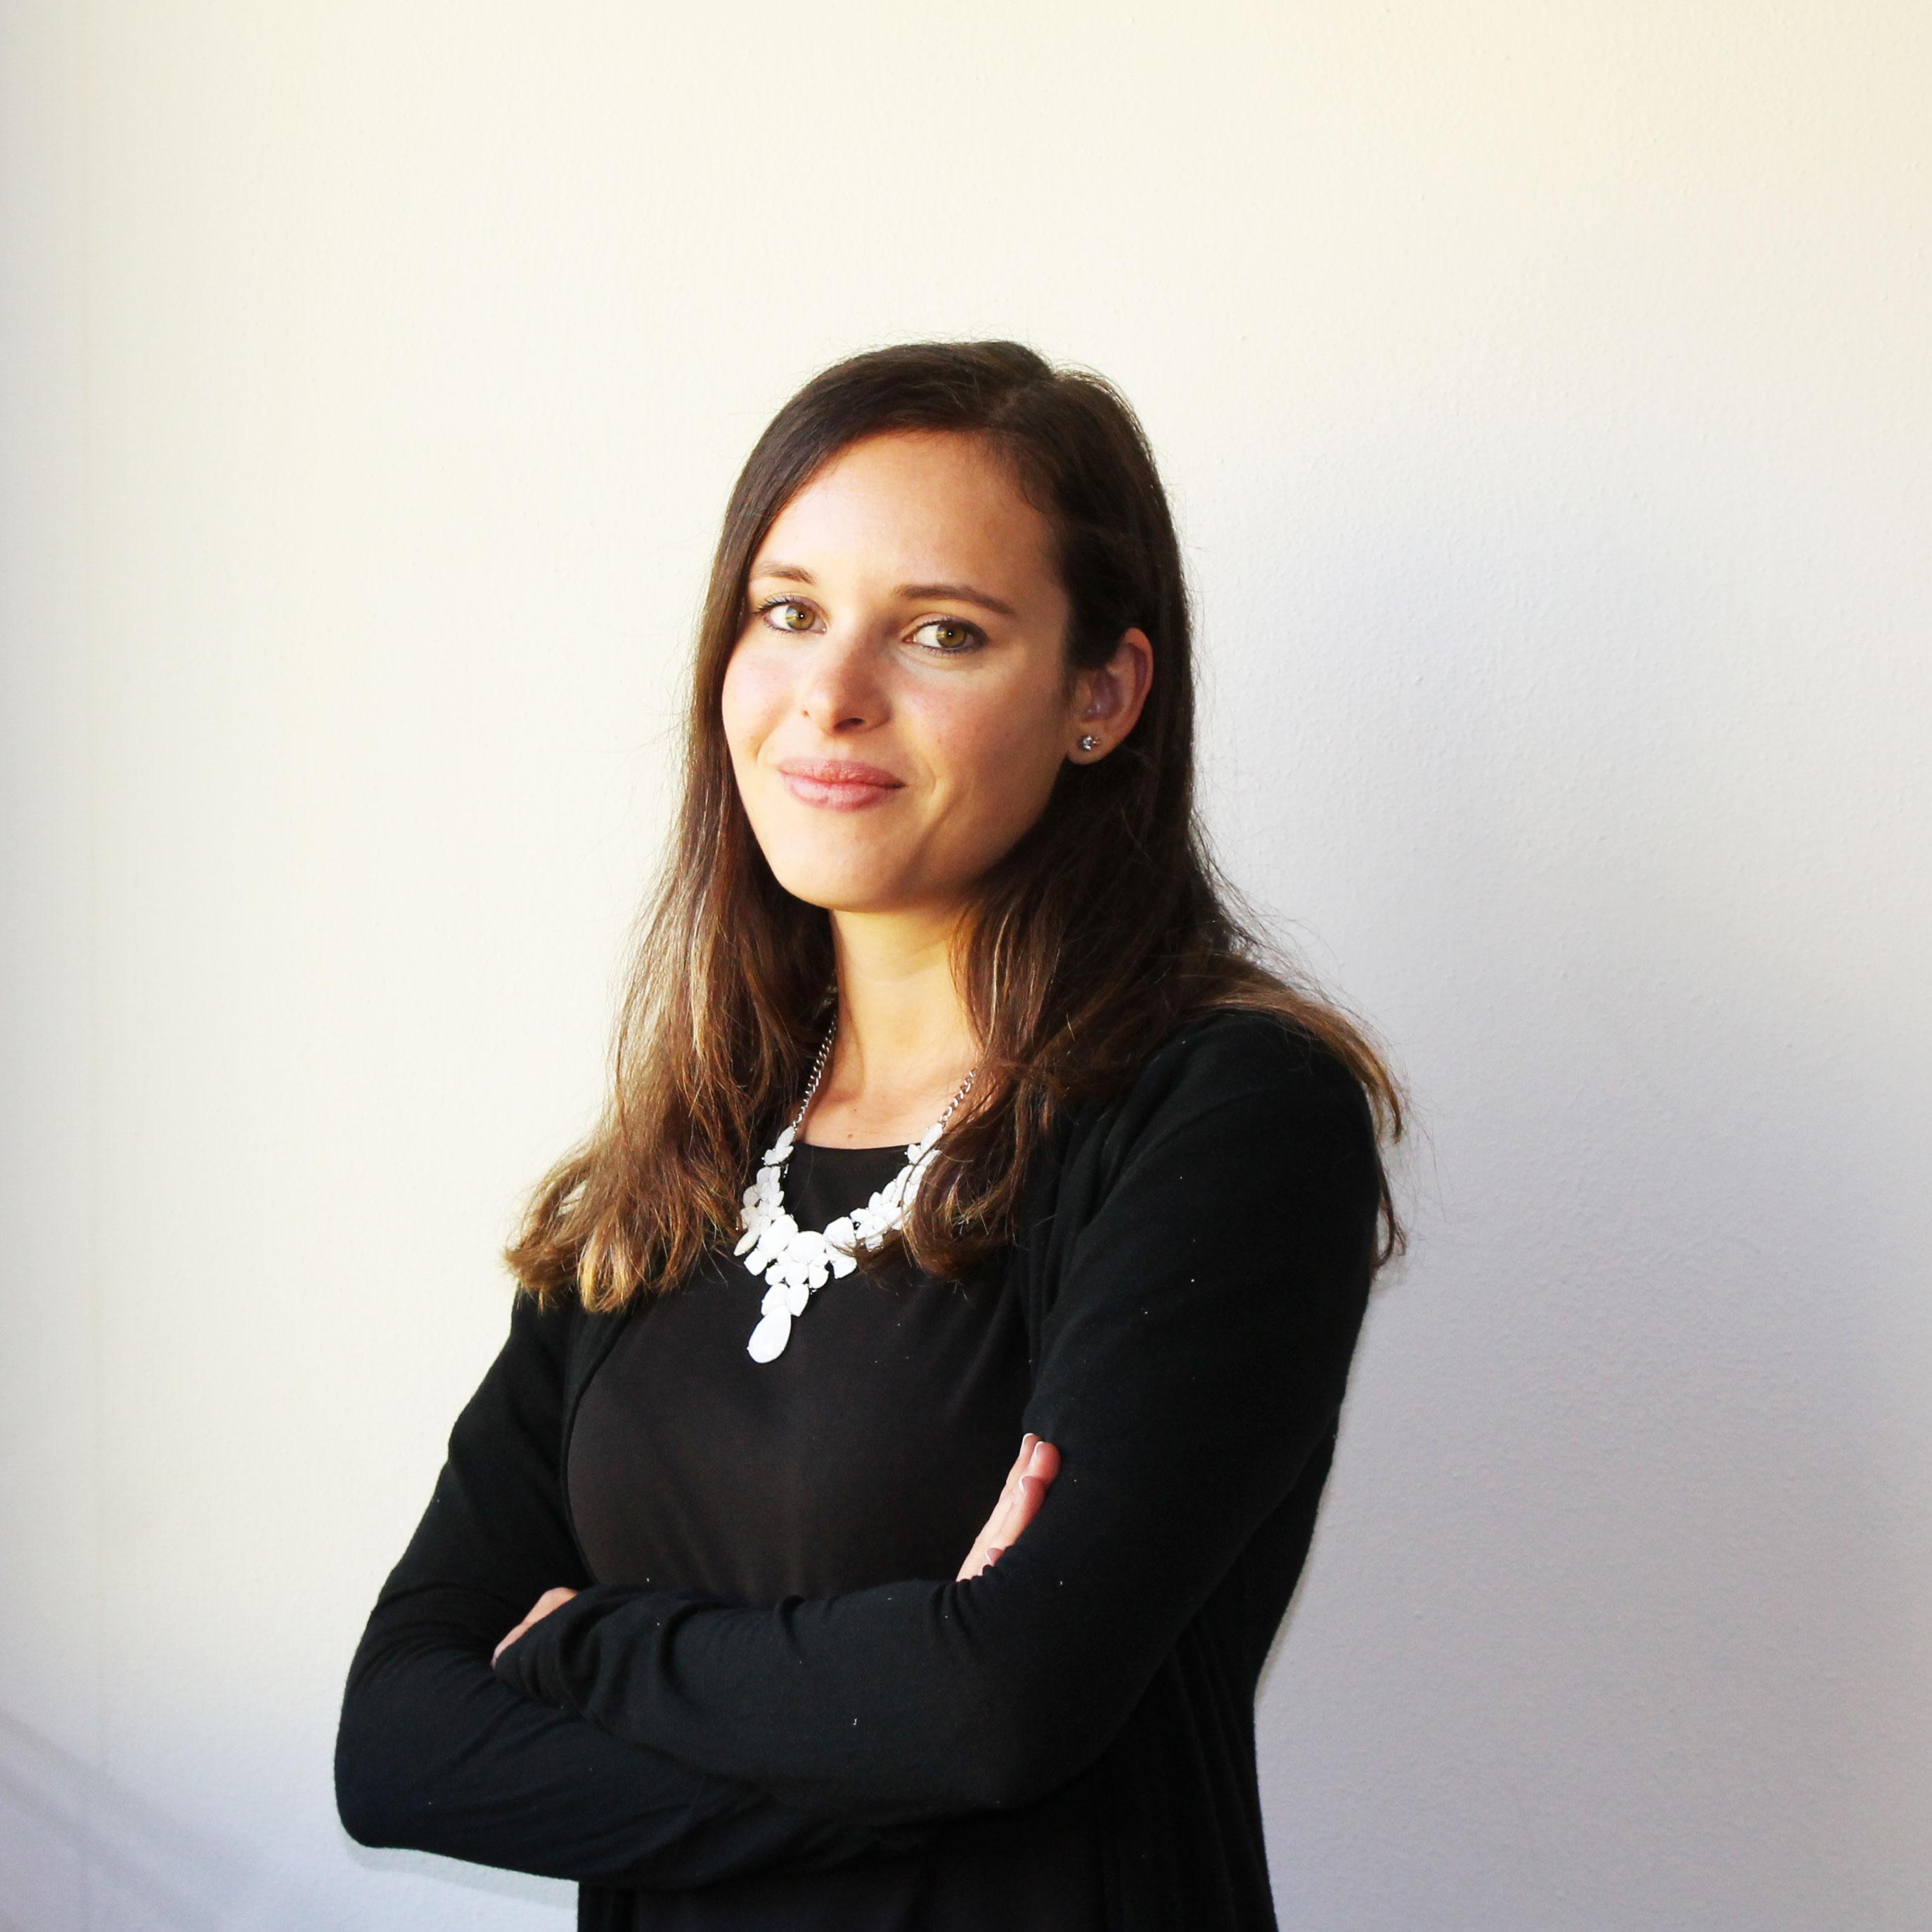 Amanda Pasquali